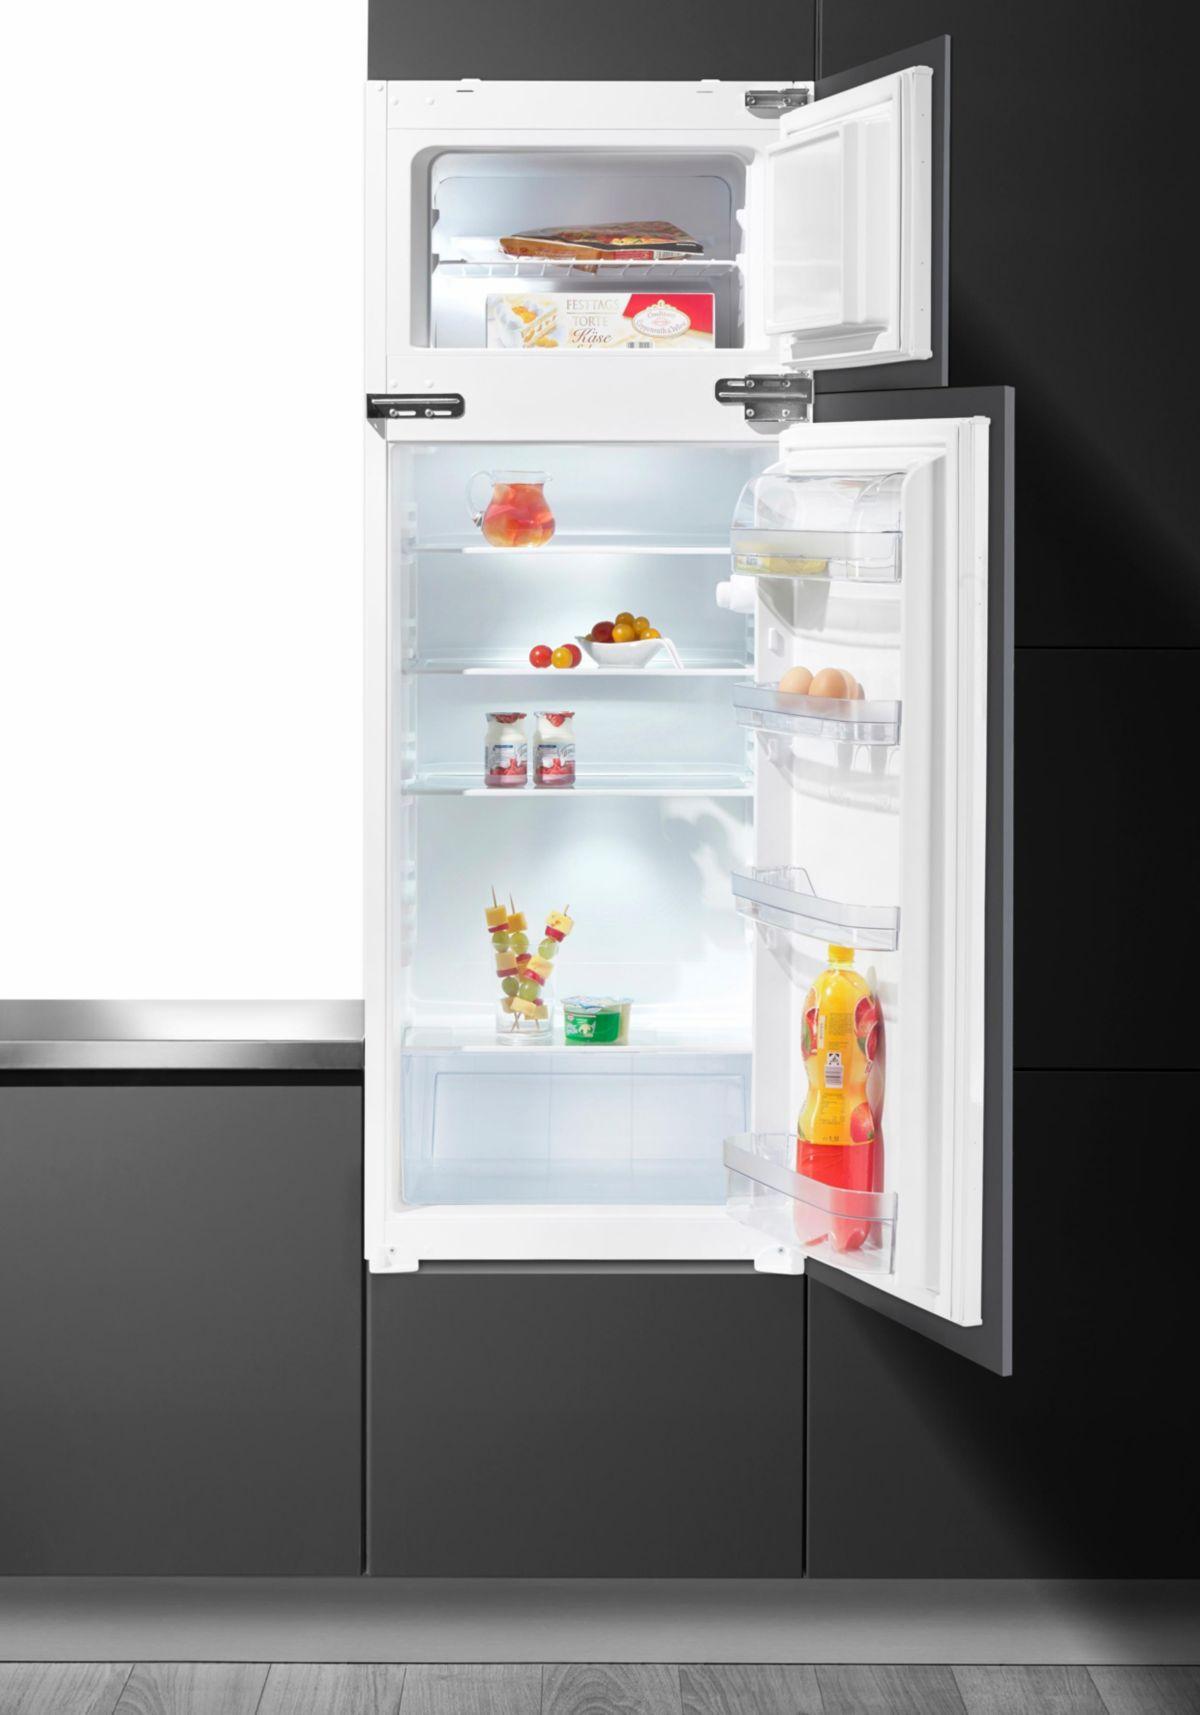 Vestfrost Einbaukühlschrank VKSE 102610 SA++ G, A++, 144,5 cm hoch